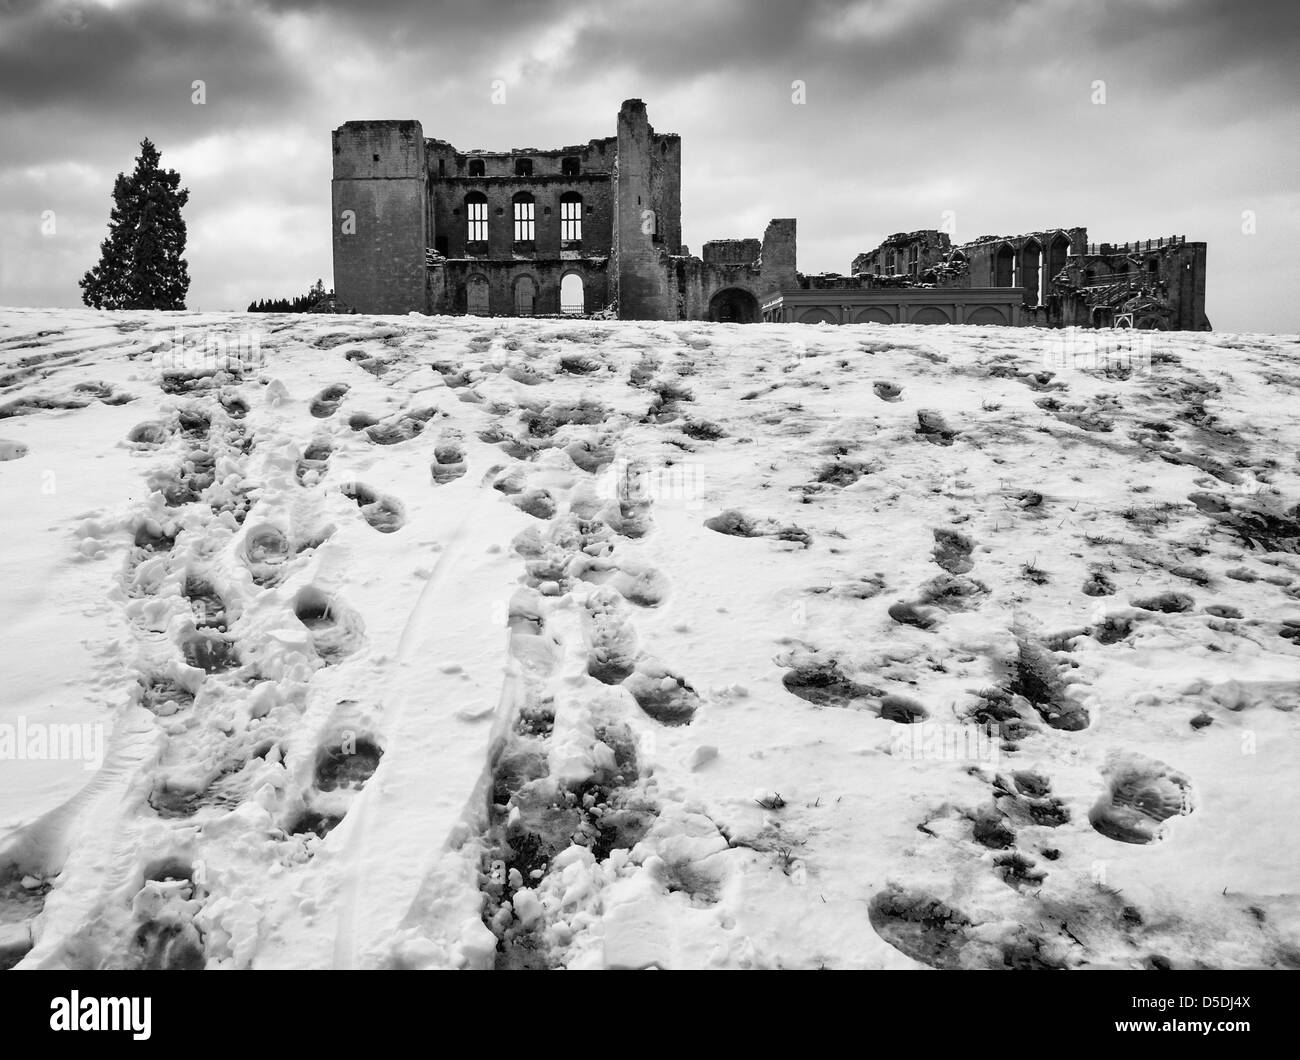 Kenilworth Castle, Warwickshire, UK in the snow. - Stock Image